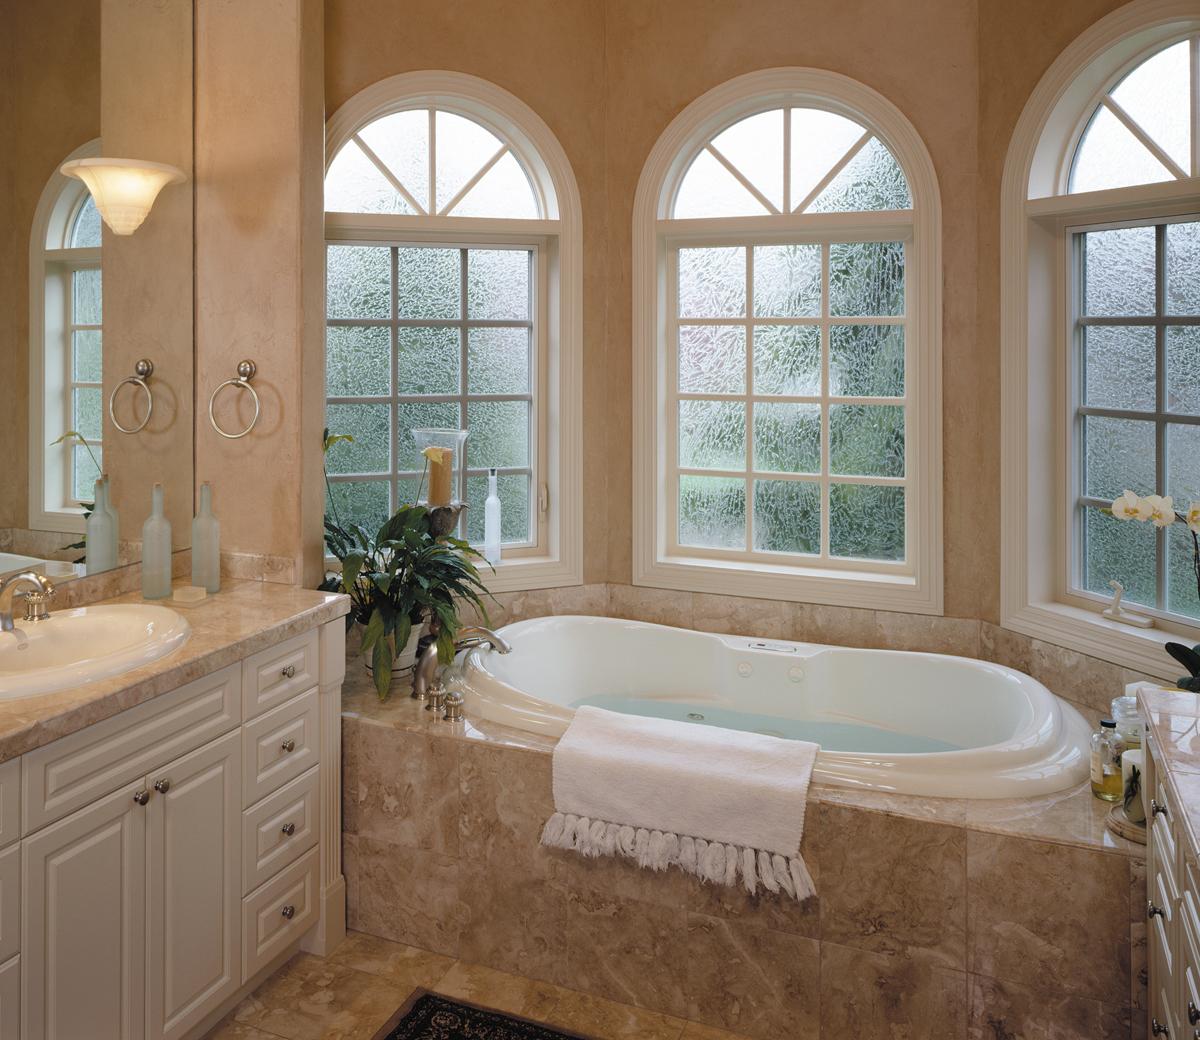 ultrawc_016_rounded window_bathtub.jpg